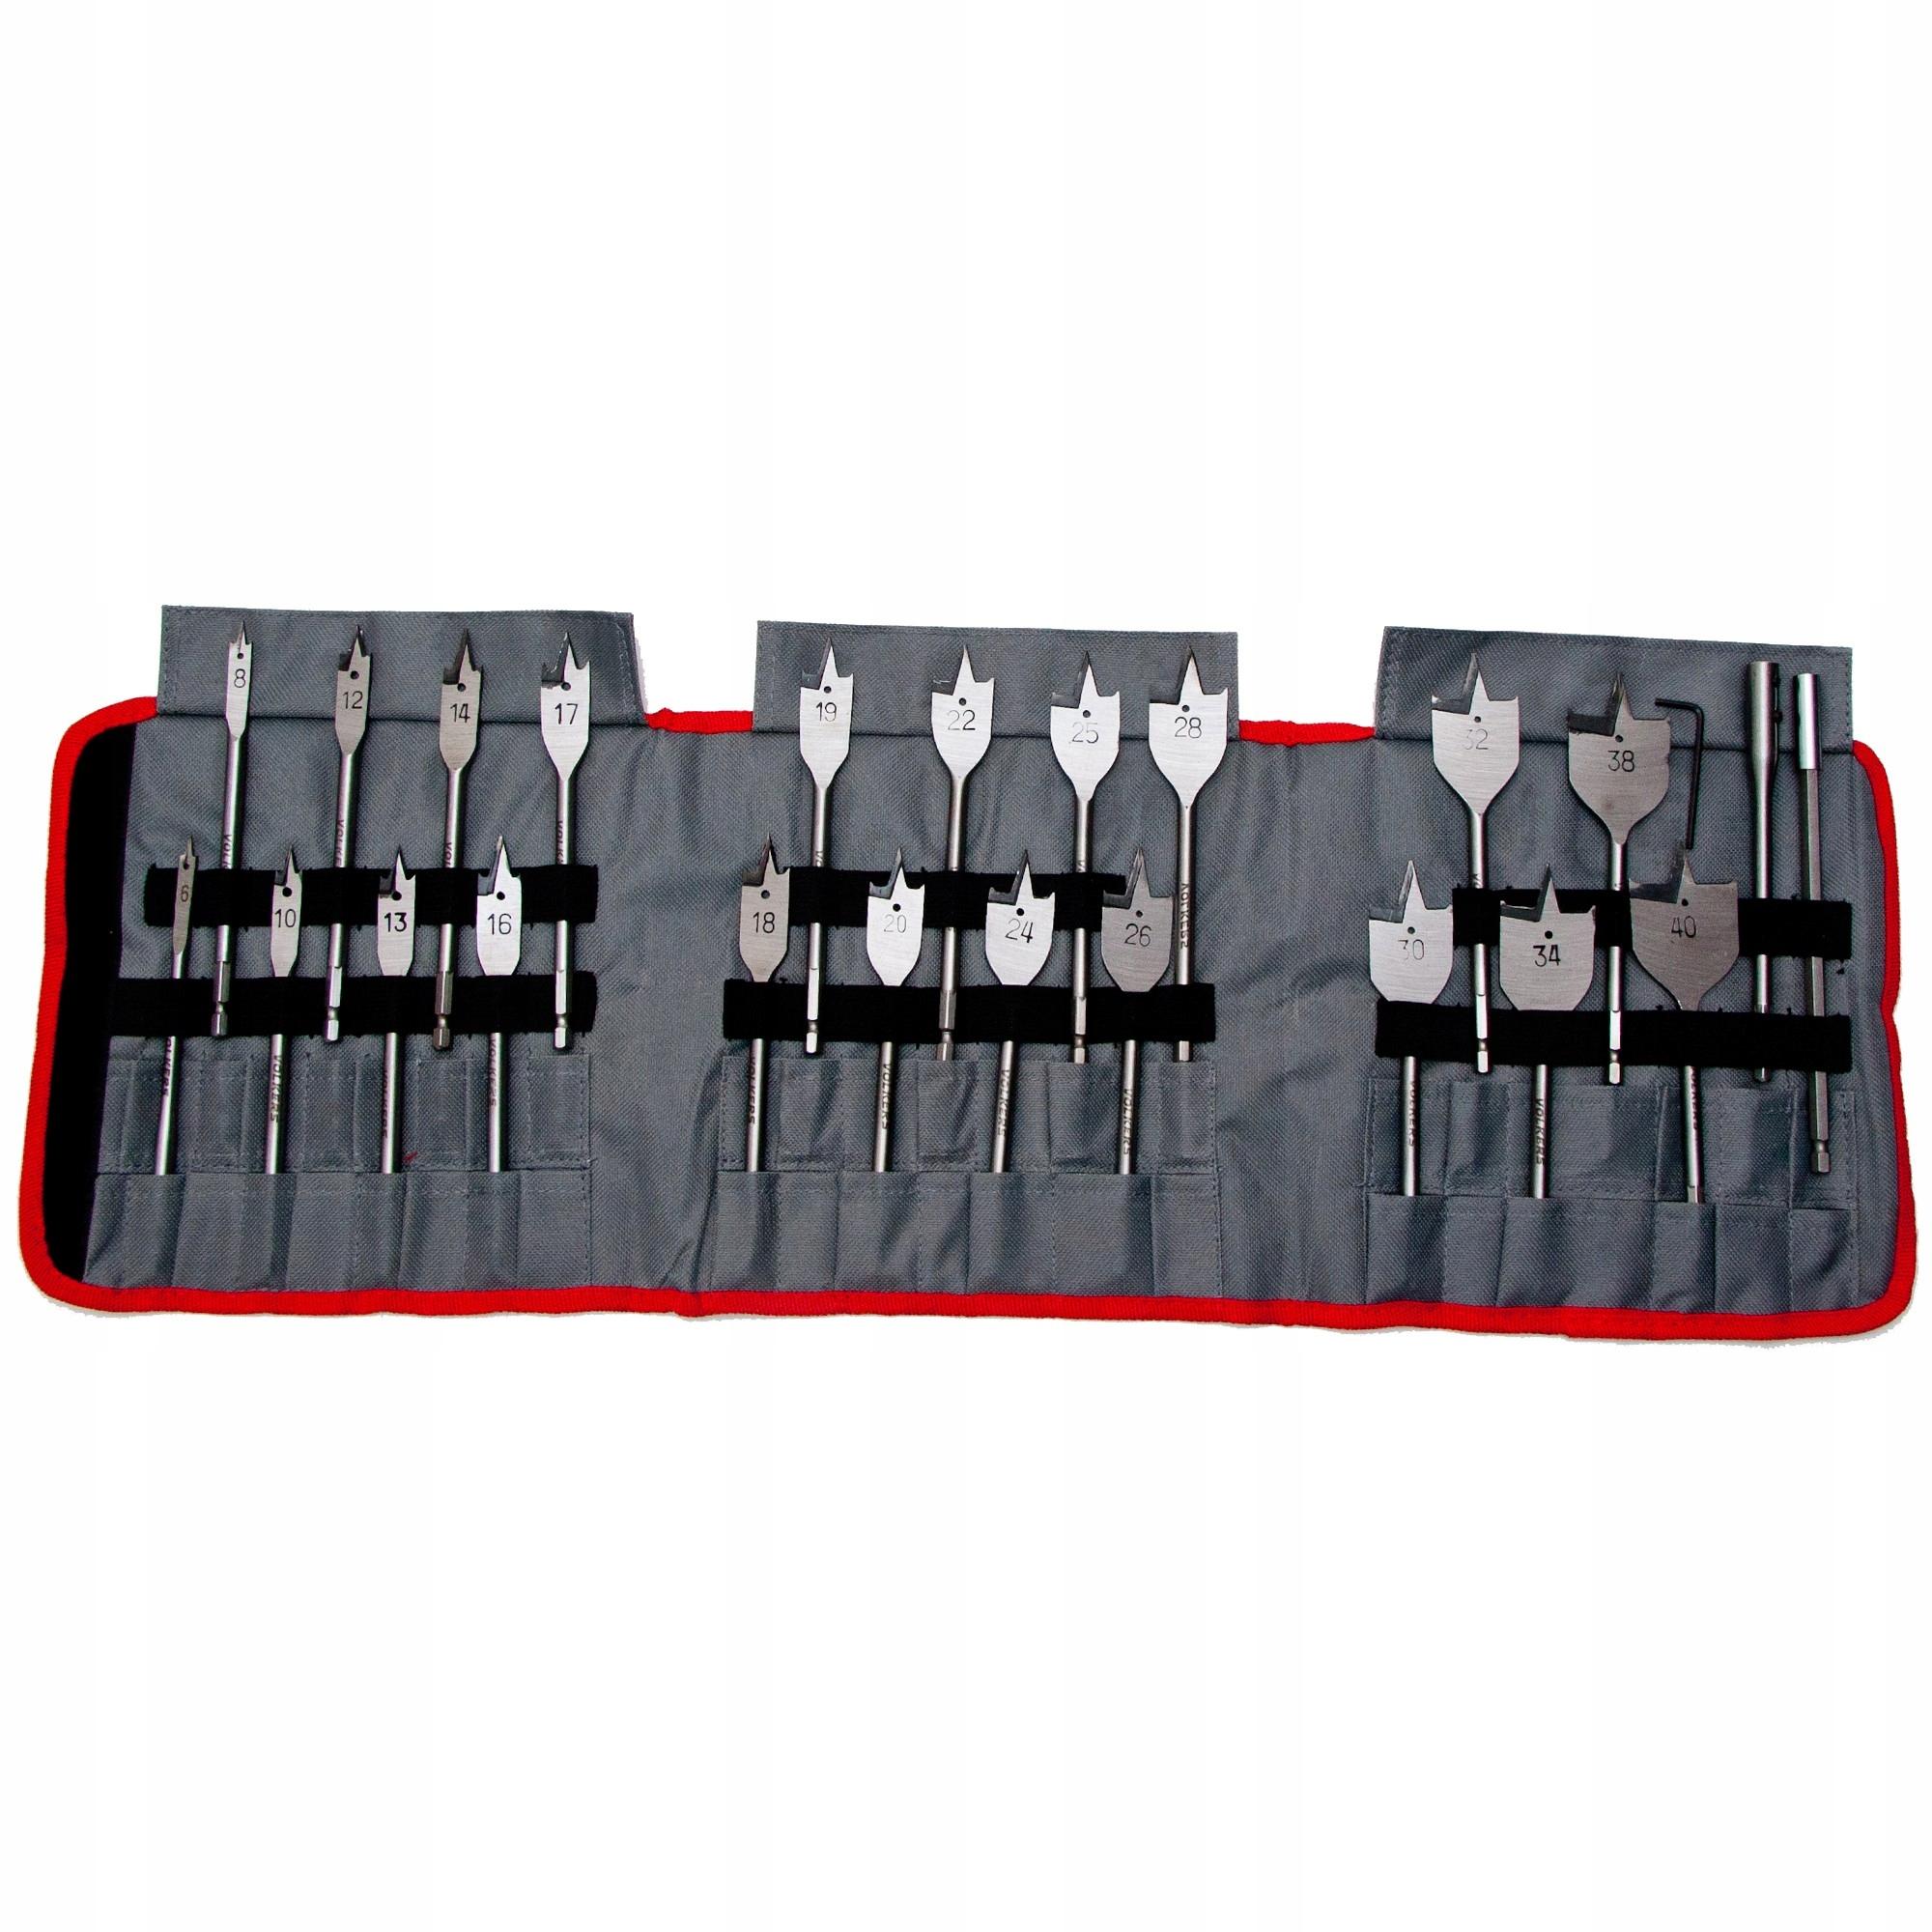 KPL. 24ks. Drevené vŕtačky, Flat 6-40x155mm